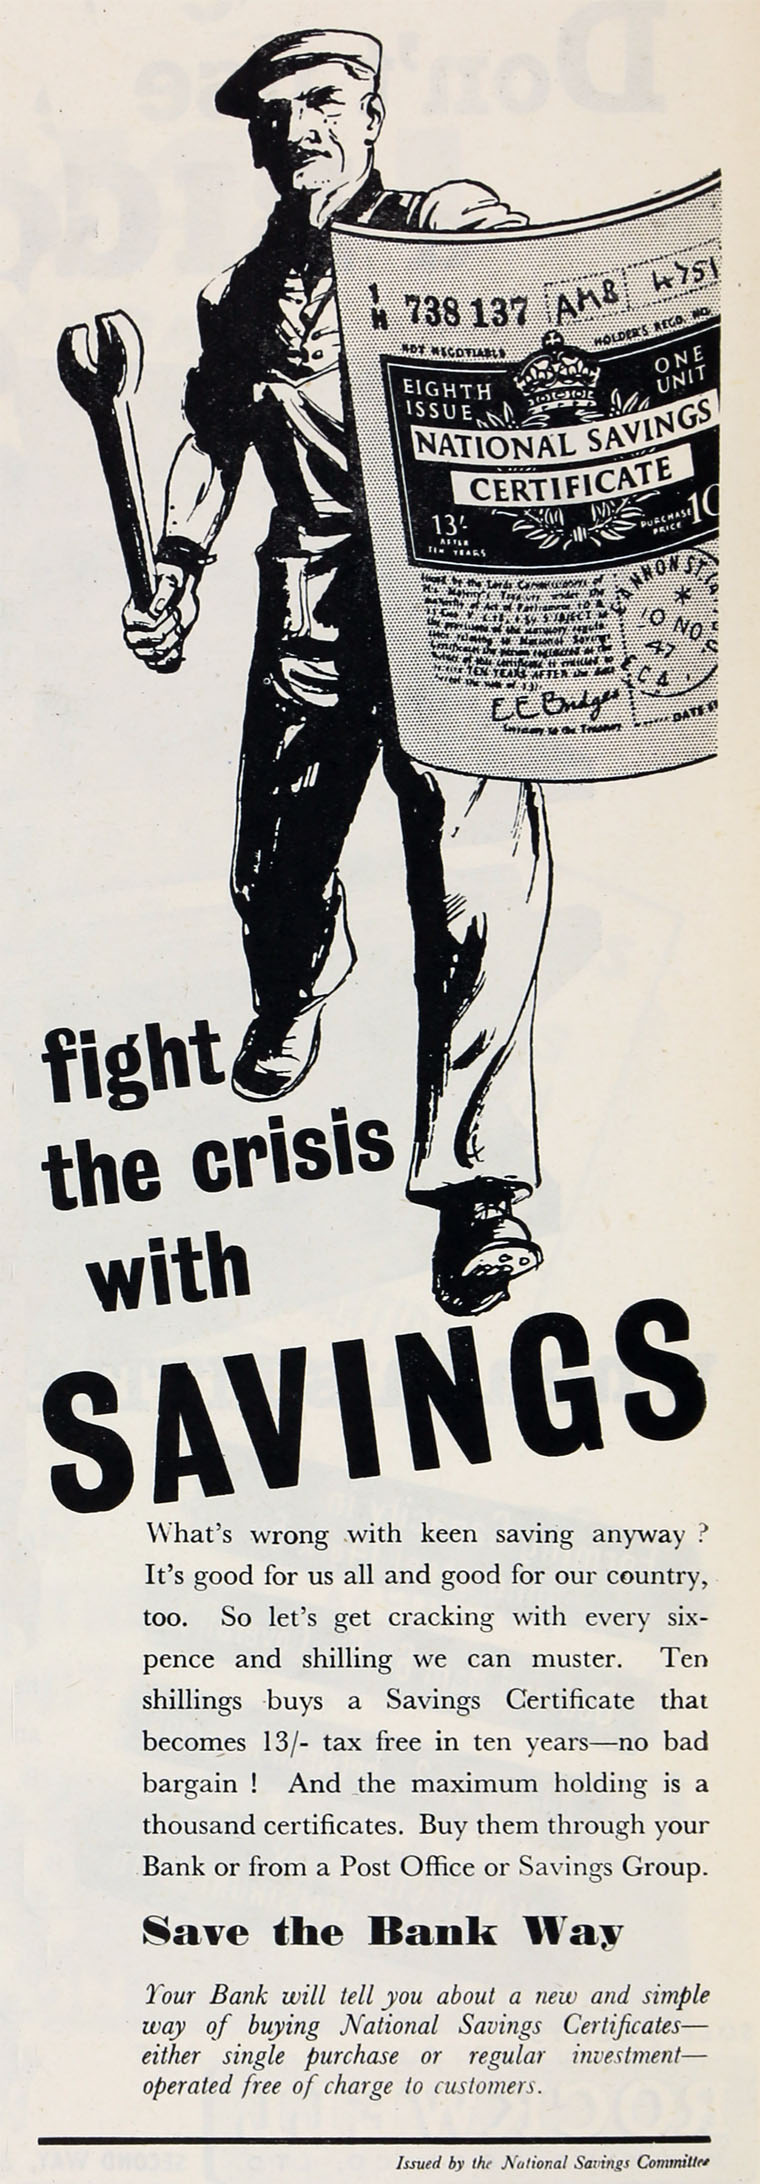 National savings committee february 1948 1betcityfo Choice Image